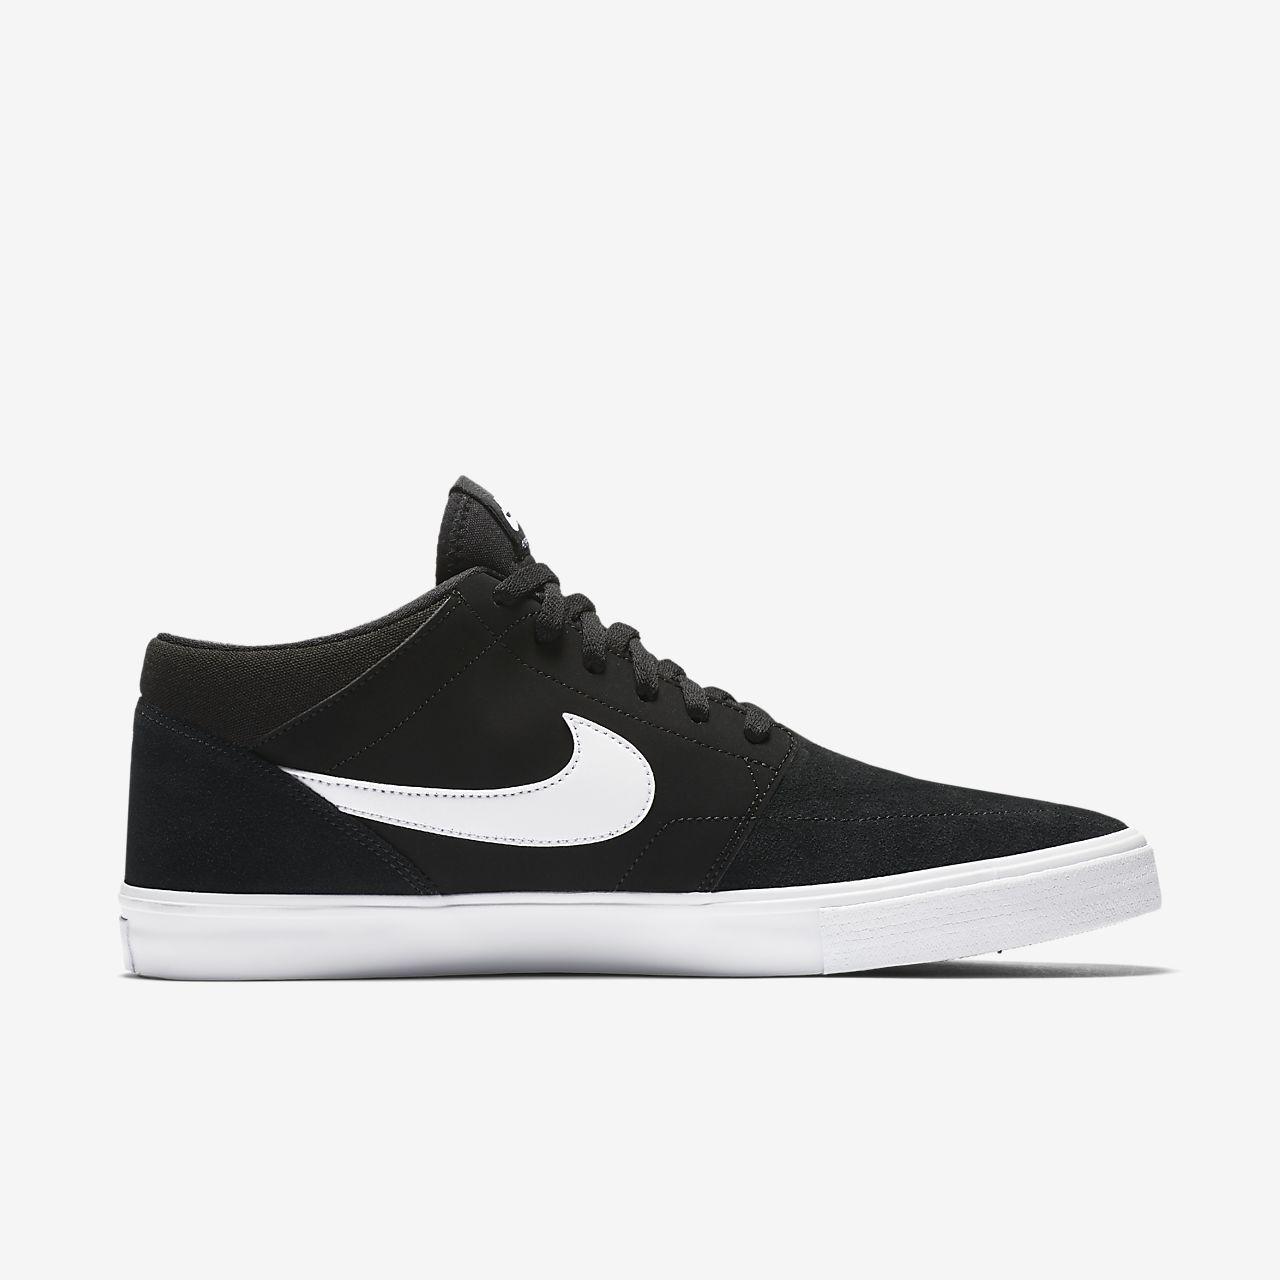 Zapatos grises Nike Solarsoft para hombre NSYpIrYc